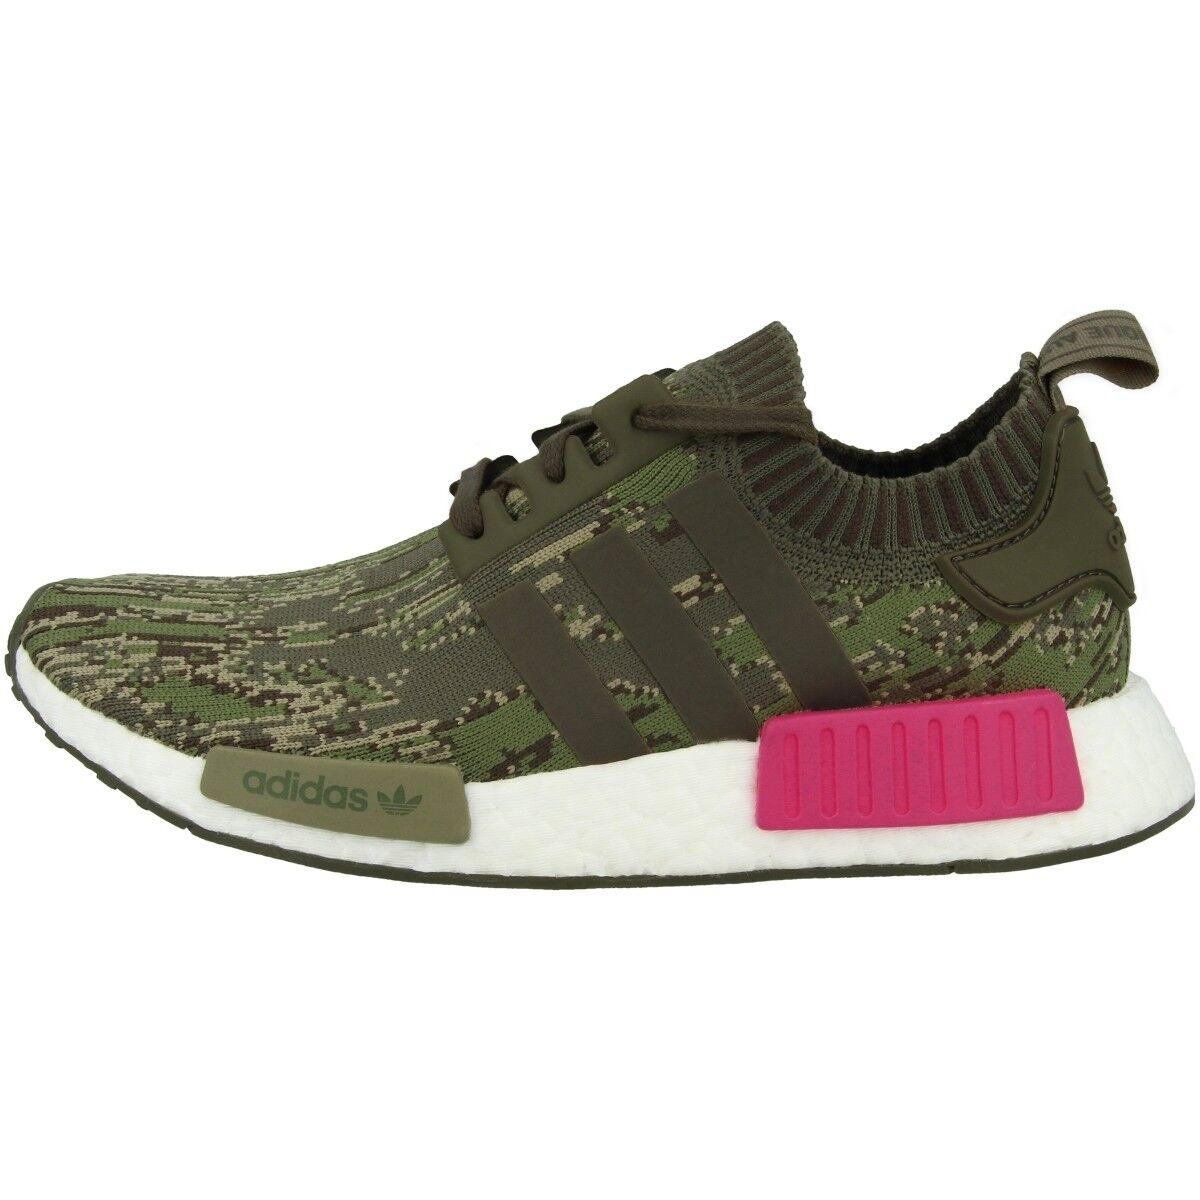 Adidas NMD_R1 Primeknit Schuhe Herren Freizeit Sneaker green utility Grau BZ0222